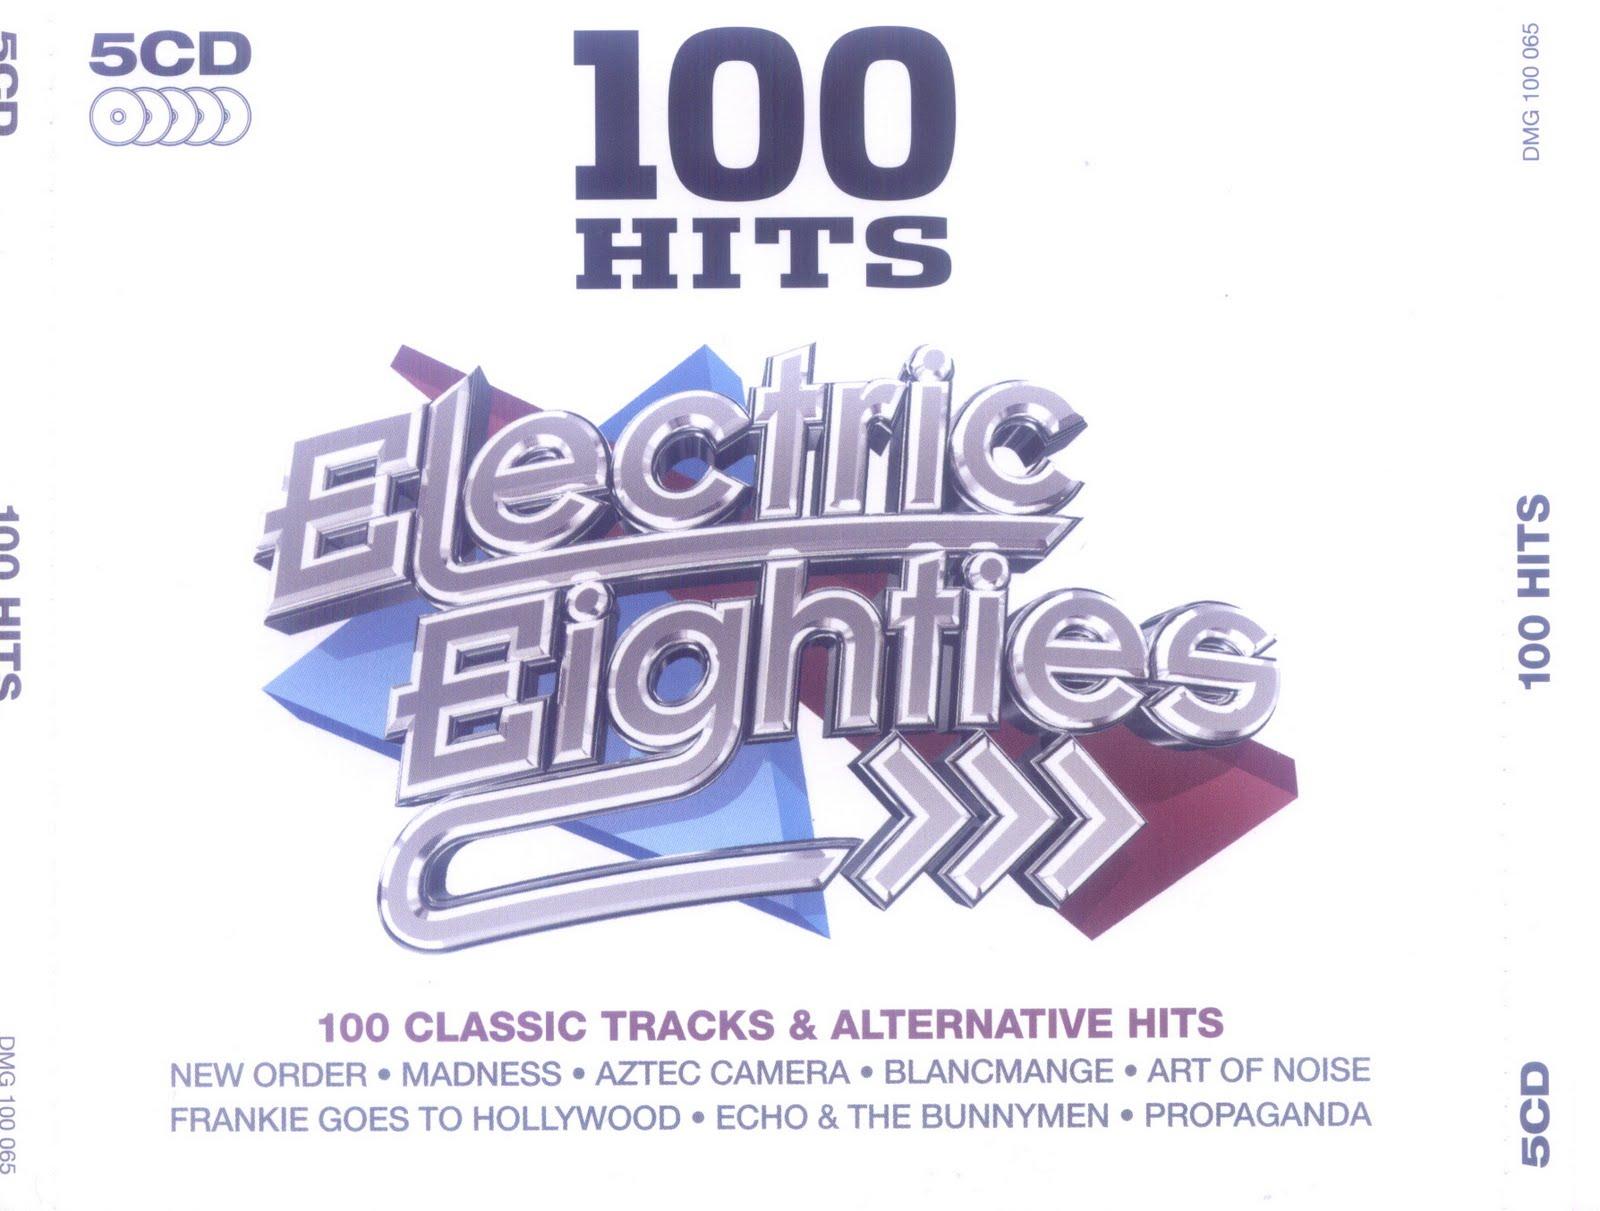 Música Para Pen Drive: 100 Hits Electric 80s (2011) 5 Cd's